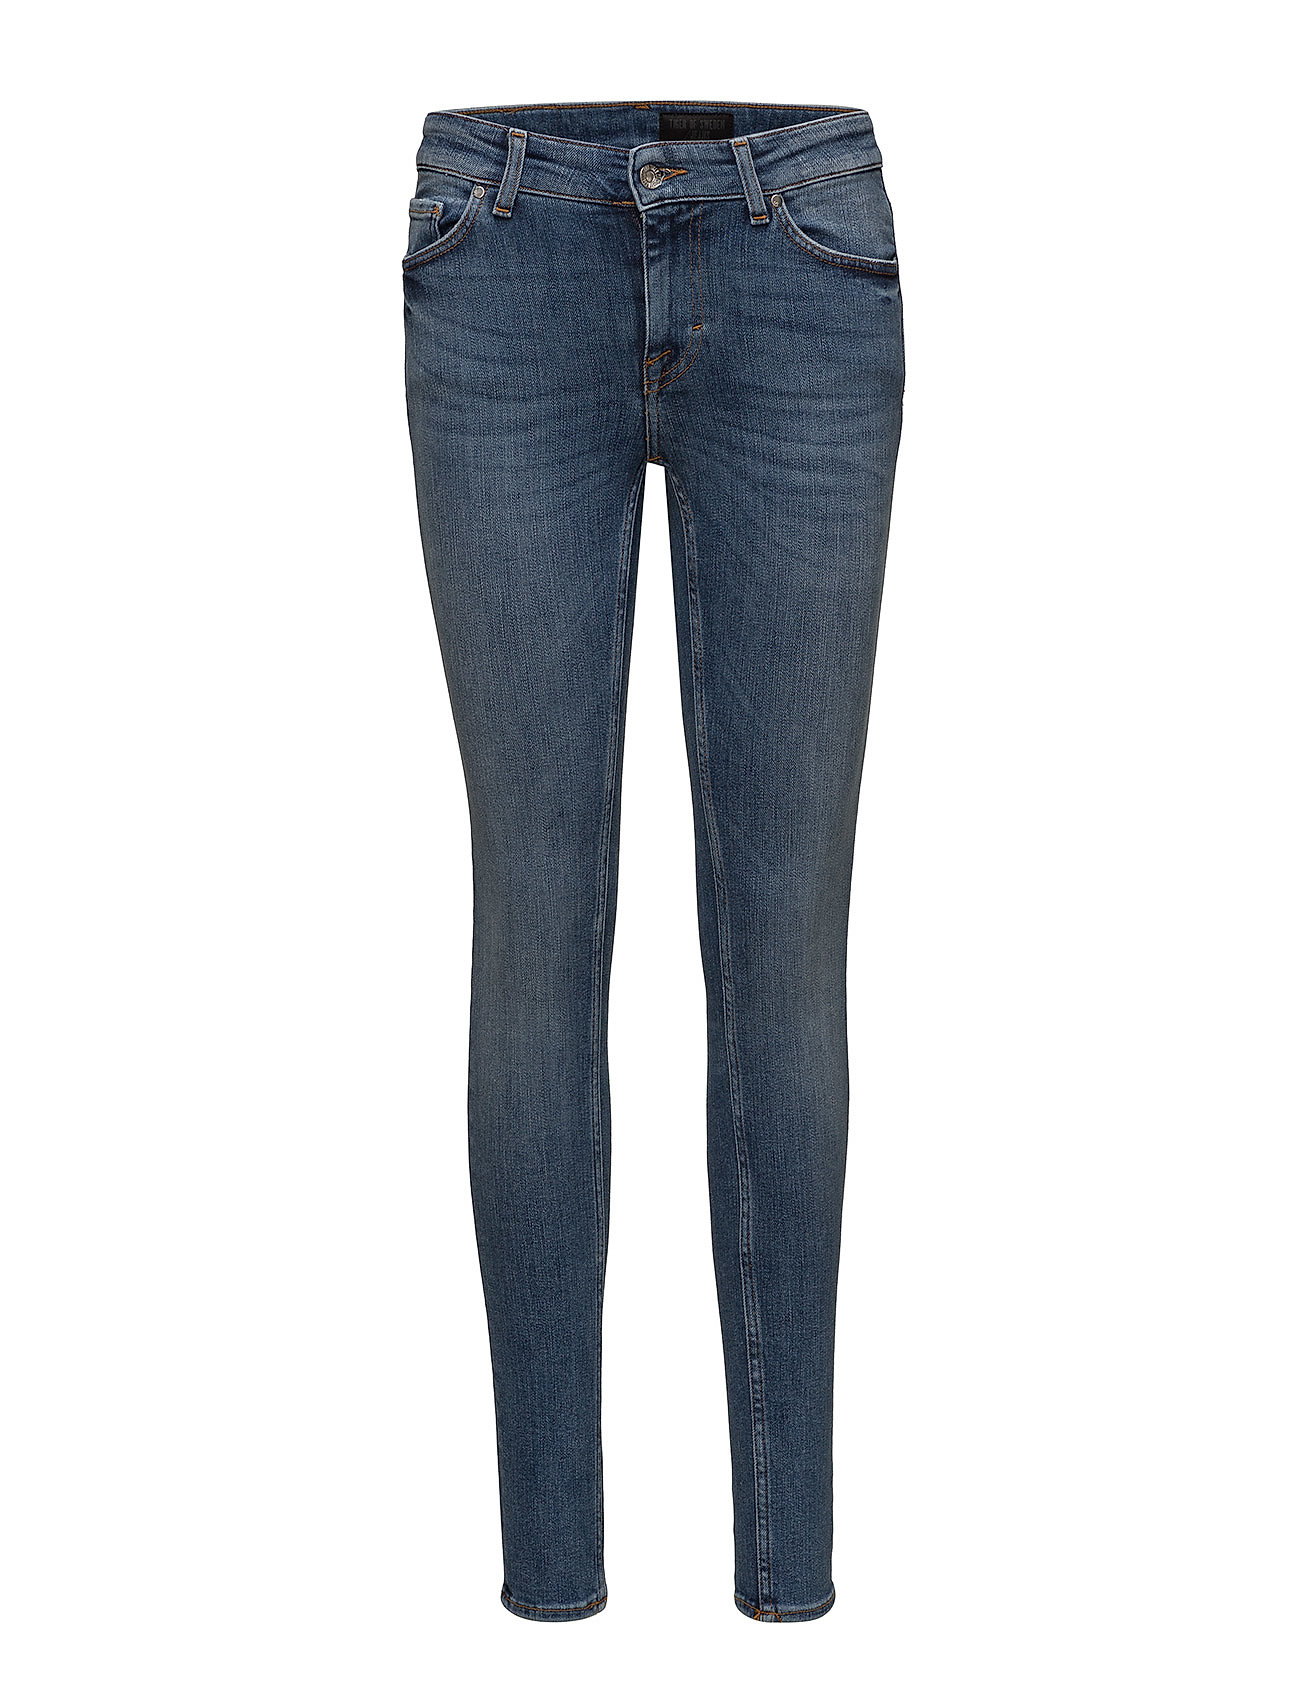 Tiger of Sweden Jeans SLIGHT - MEDIUM BLUE